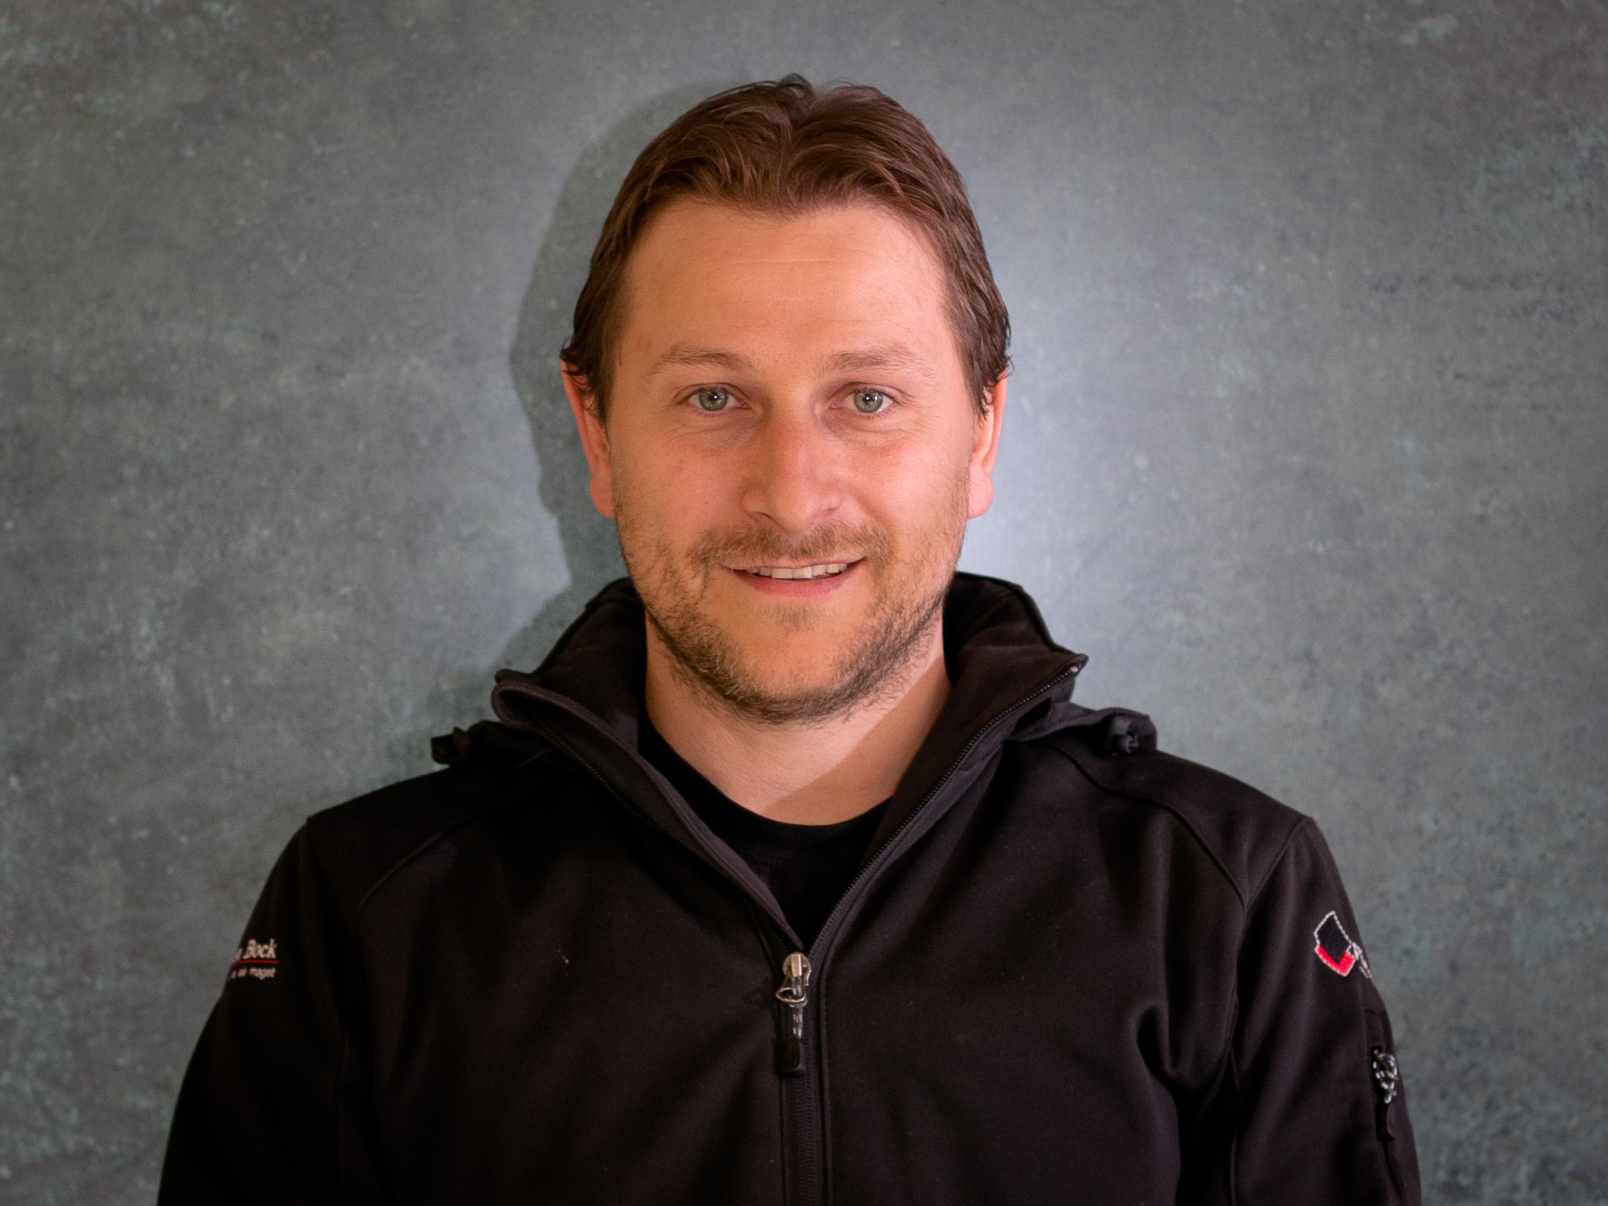 Dietmar Thöni